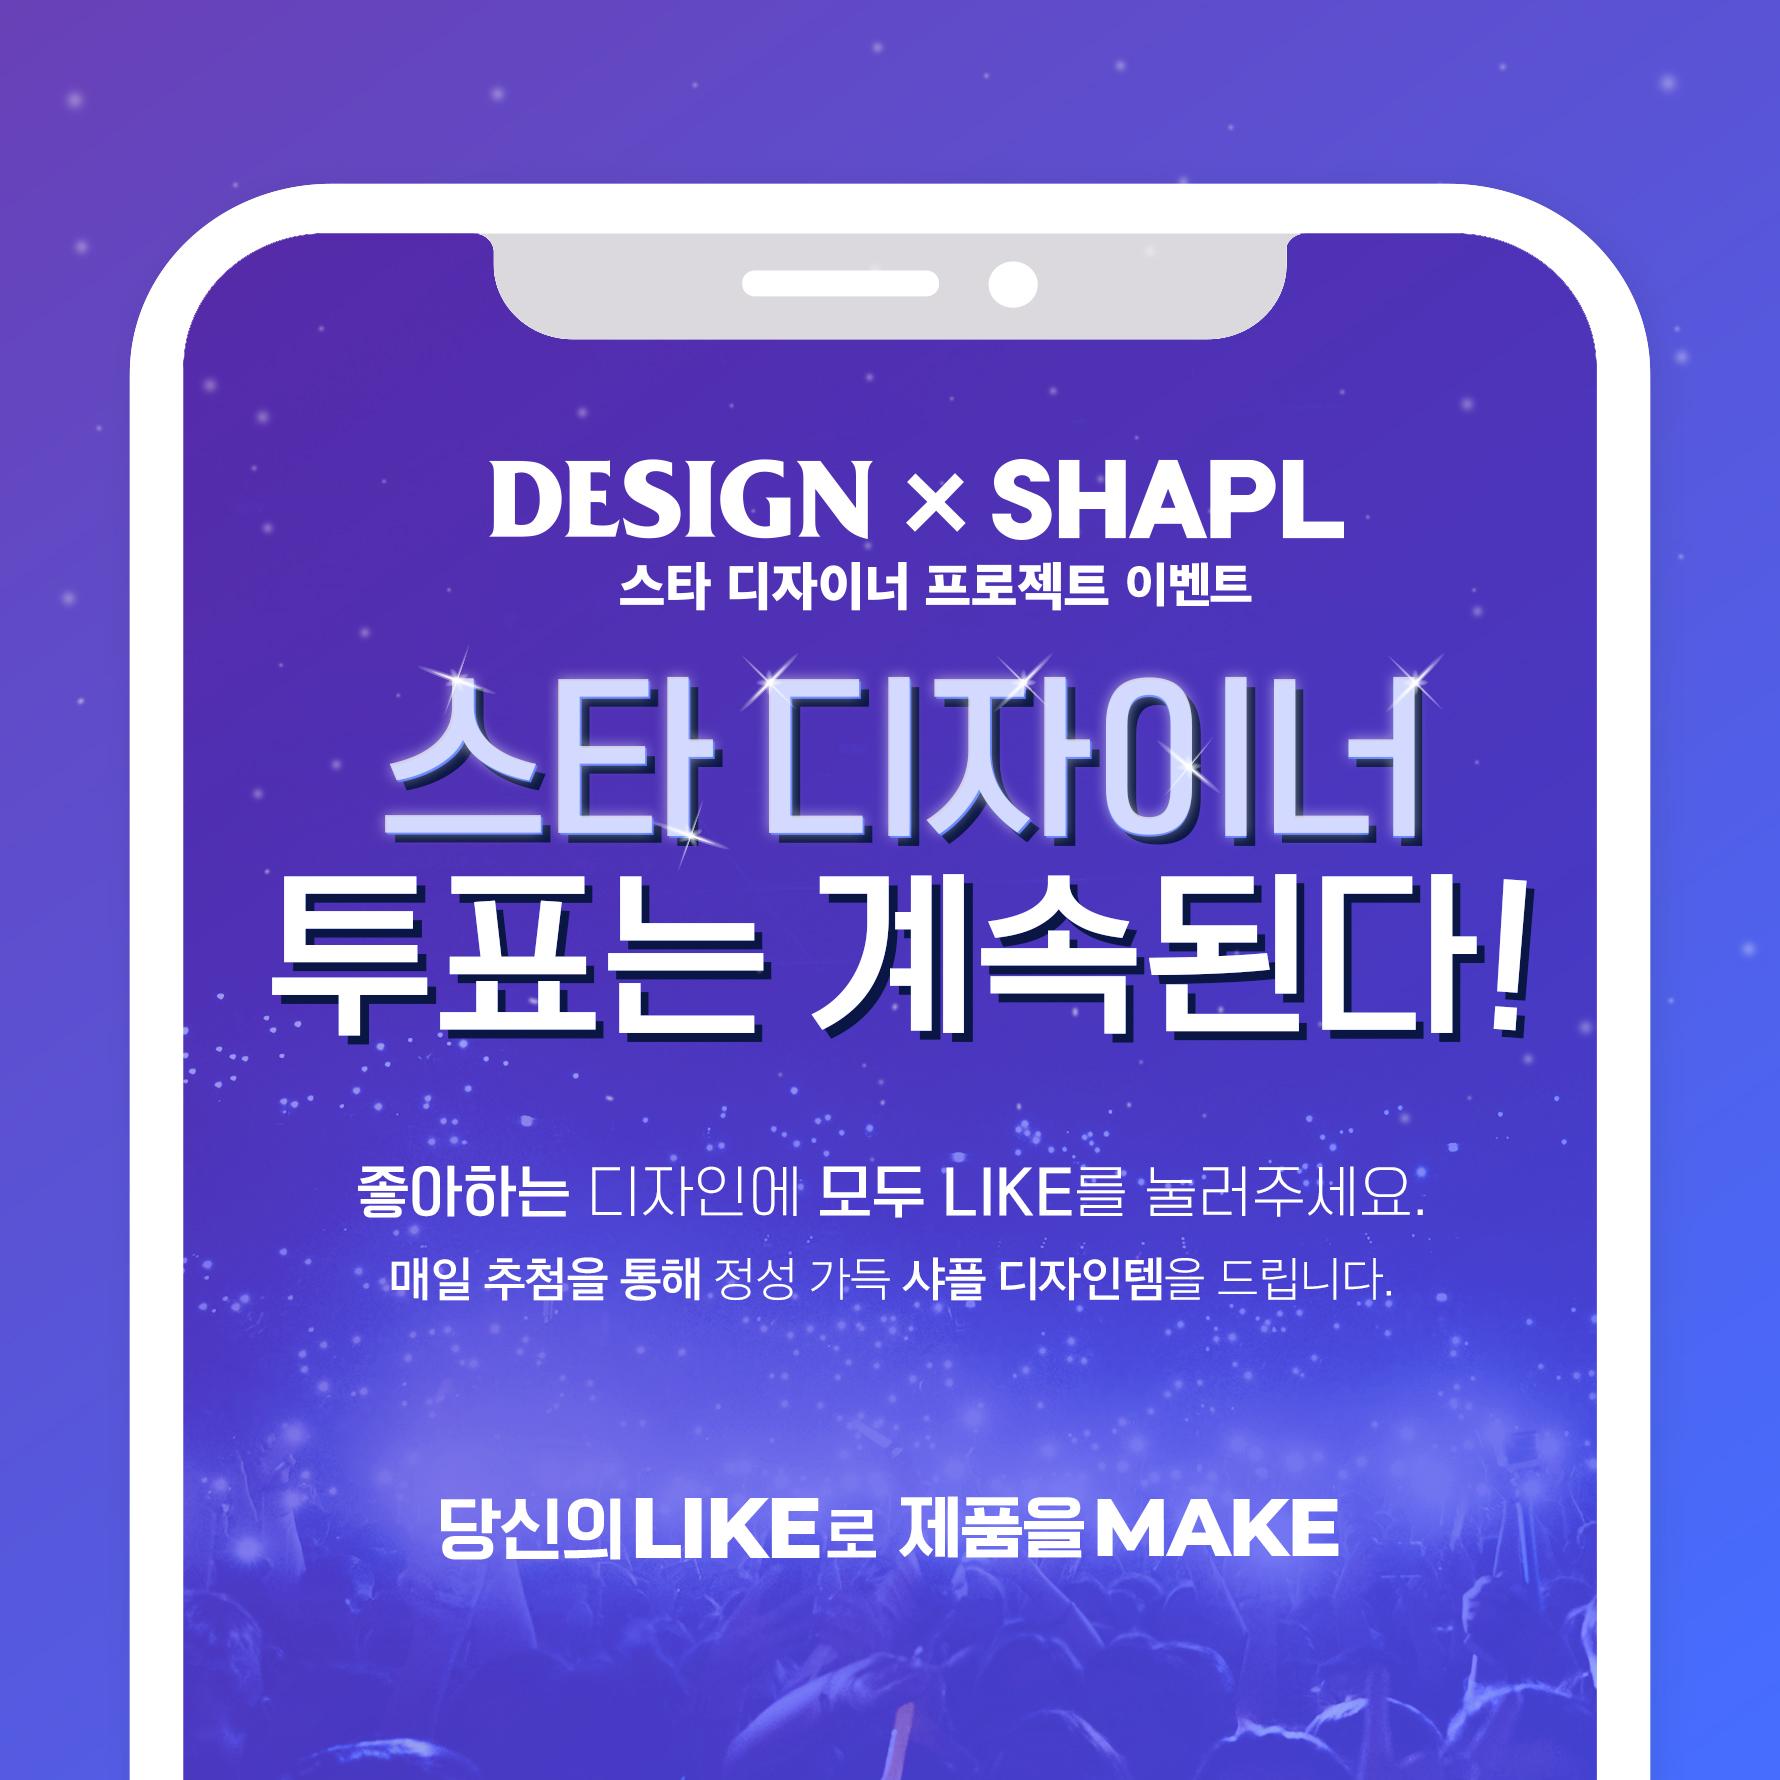 201901/SDF_SHAPL_Stardesign_Voting_181227_최종.jpg